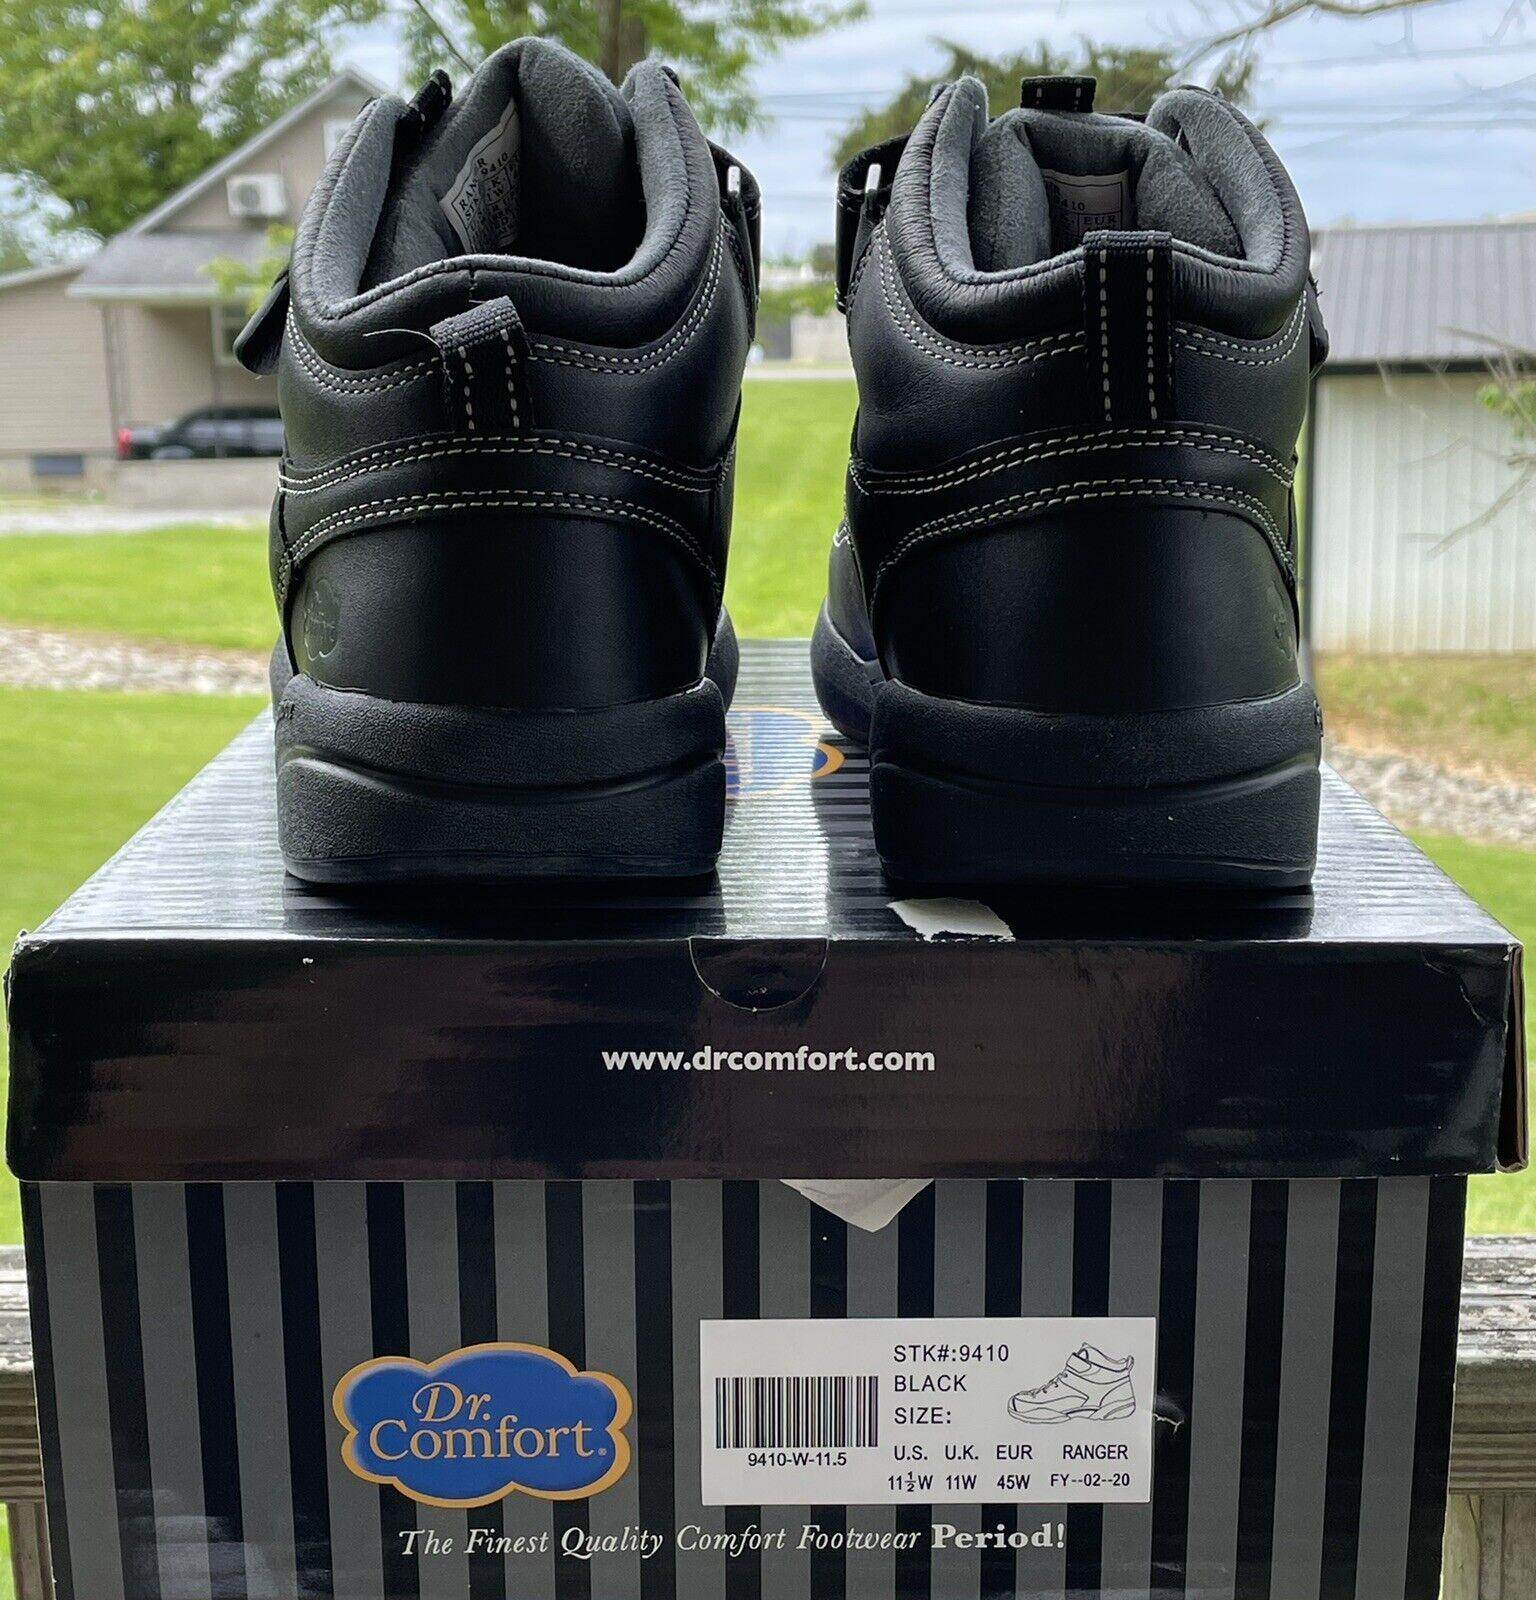 Dr. Comfort Ranger Men's Therapeutic Diabetic Hiking Boot Black 11.5 W.*NEW/BOX*